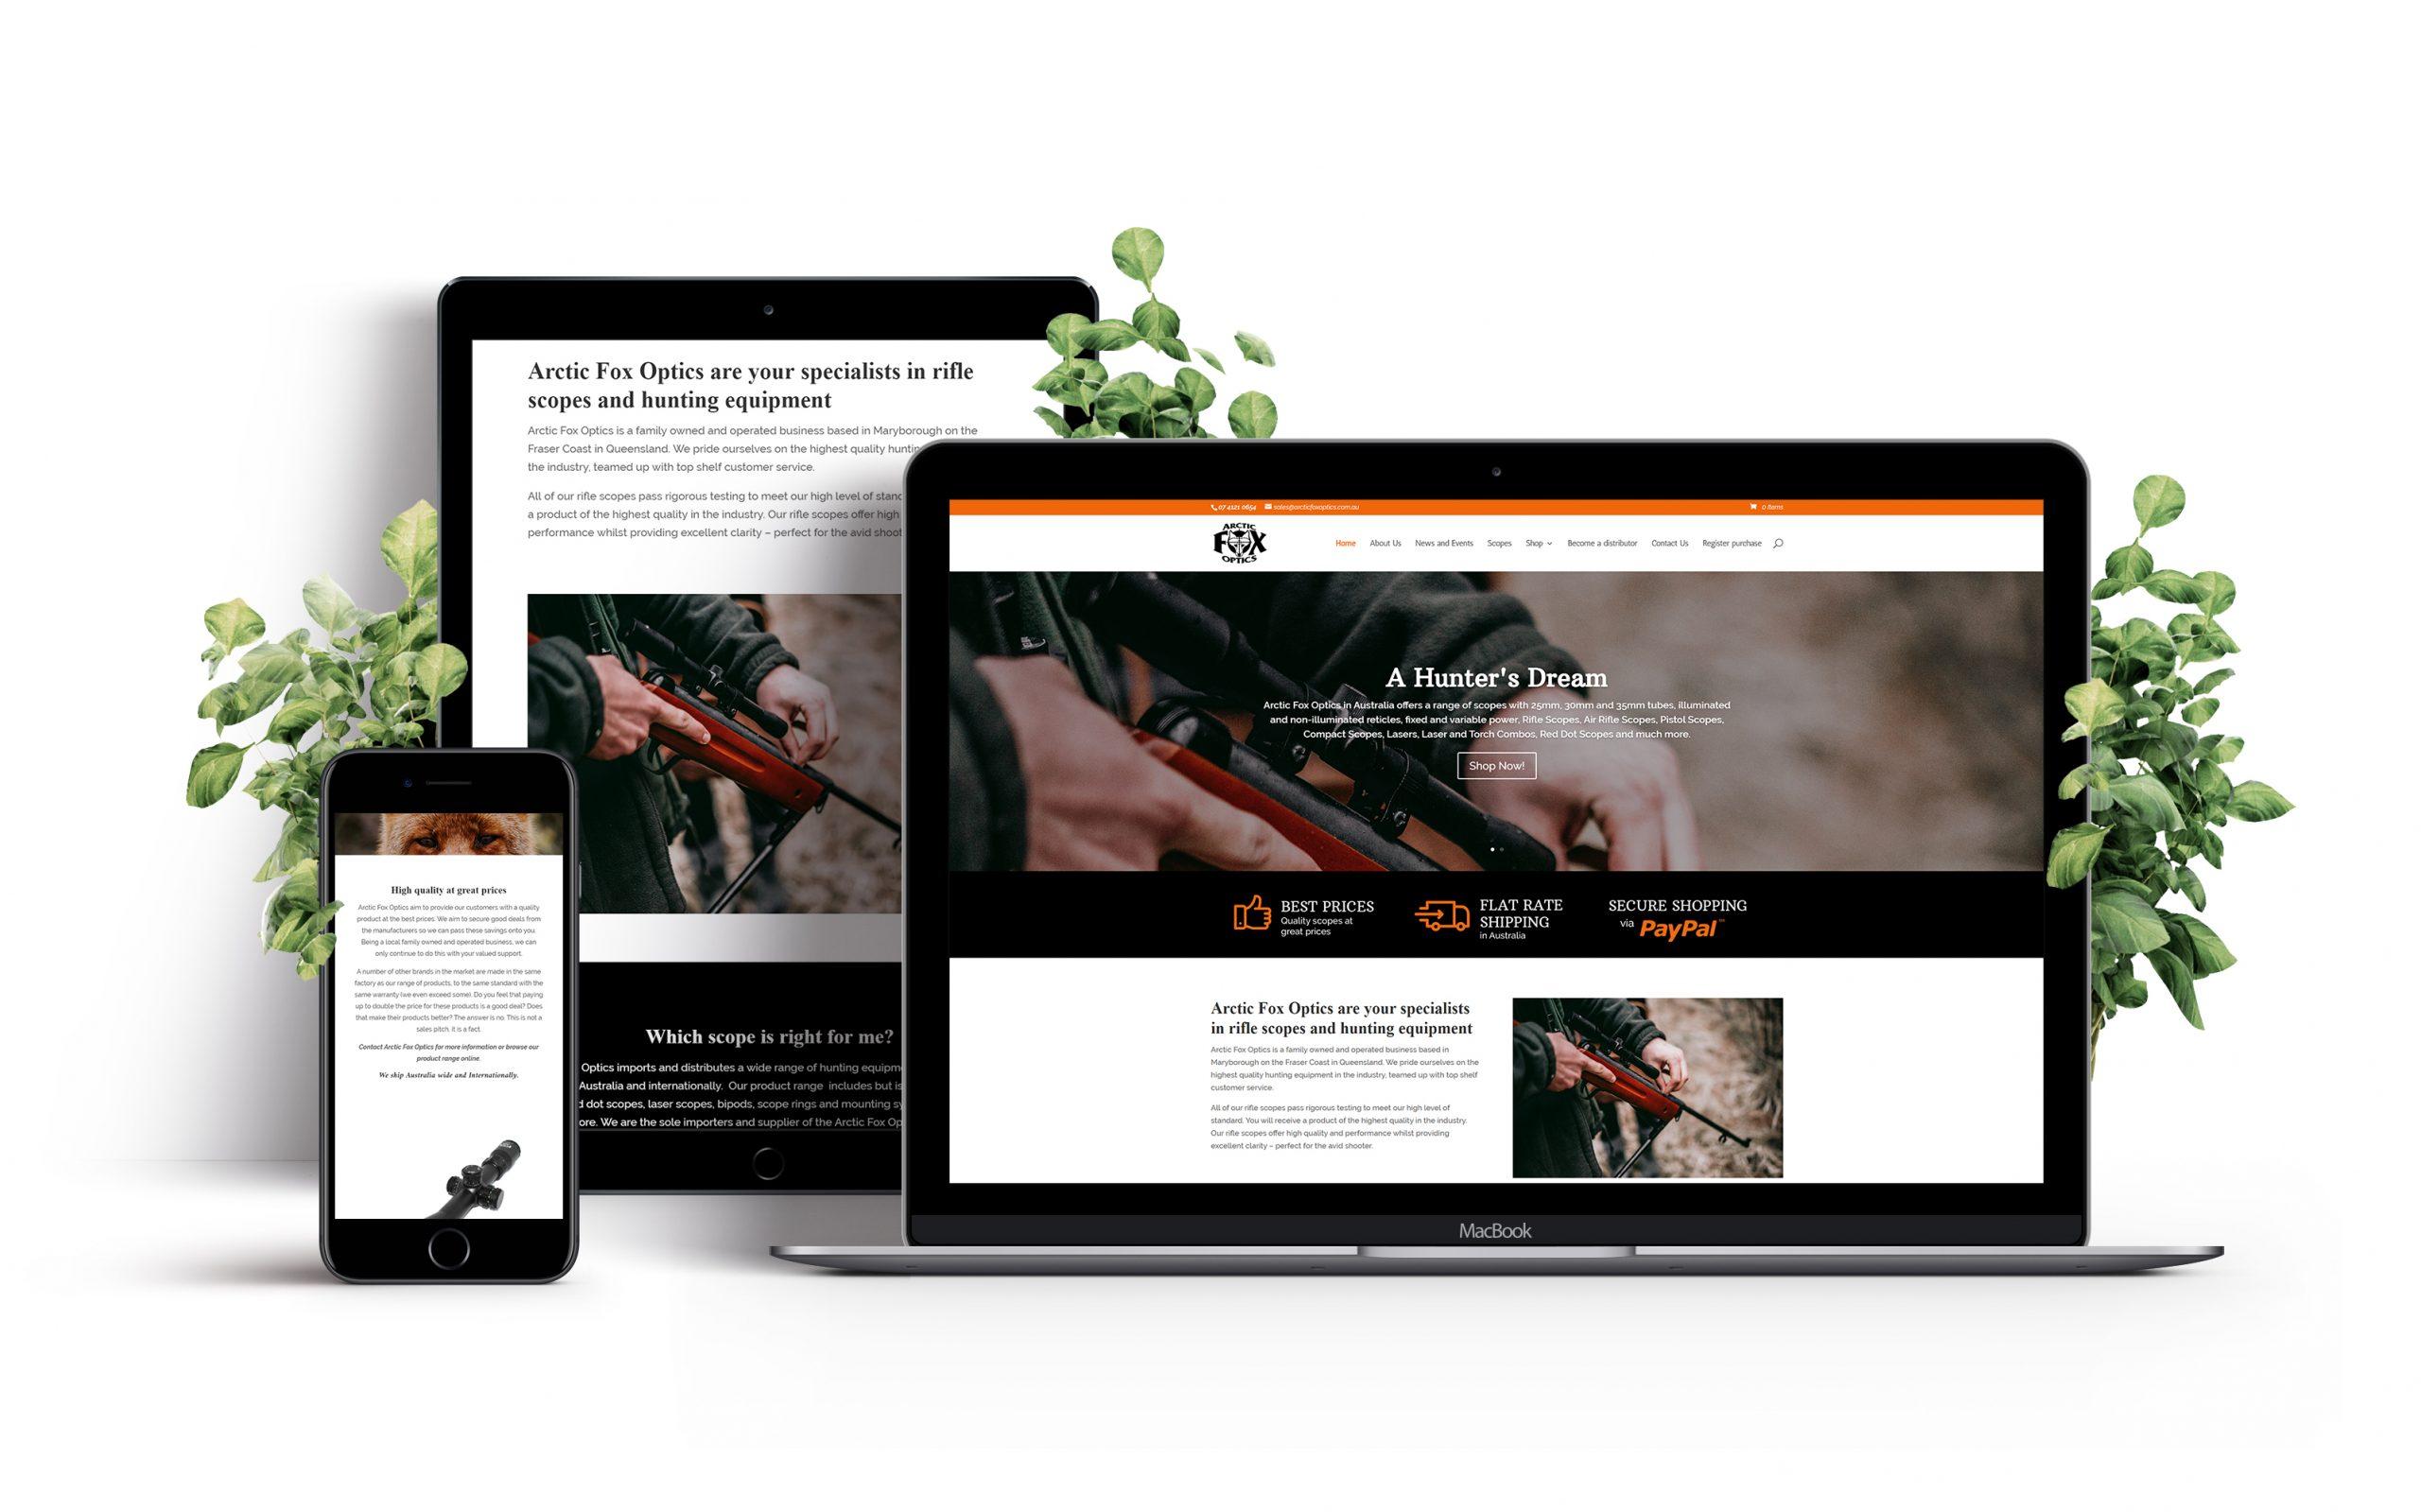 Arctic Fox Optics website is now live!